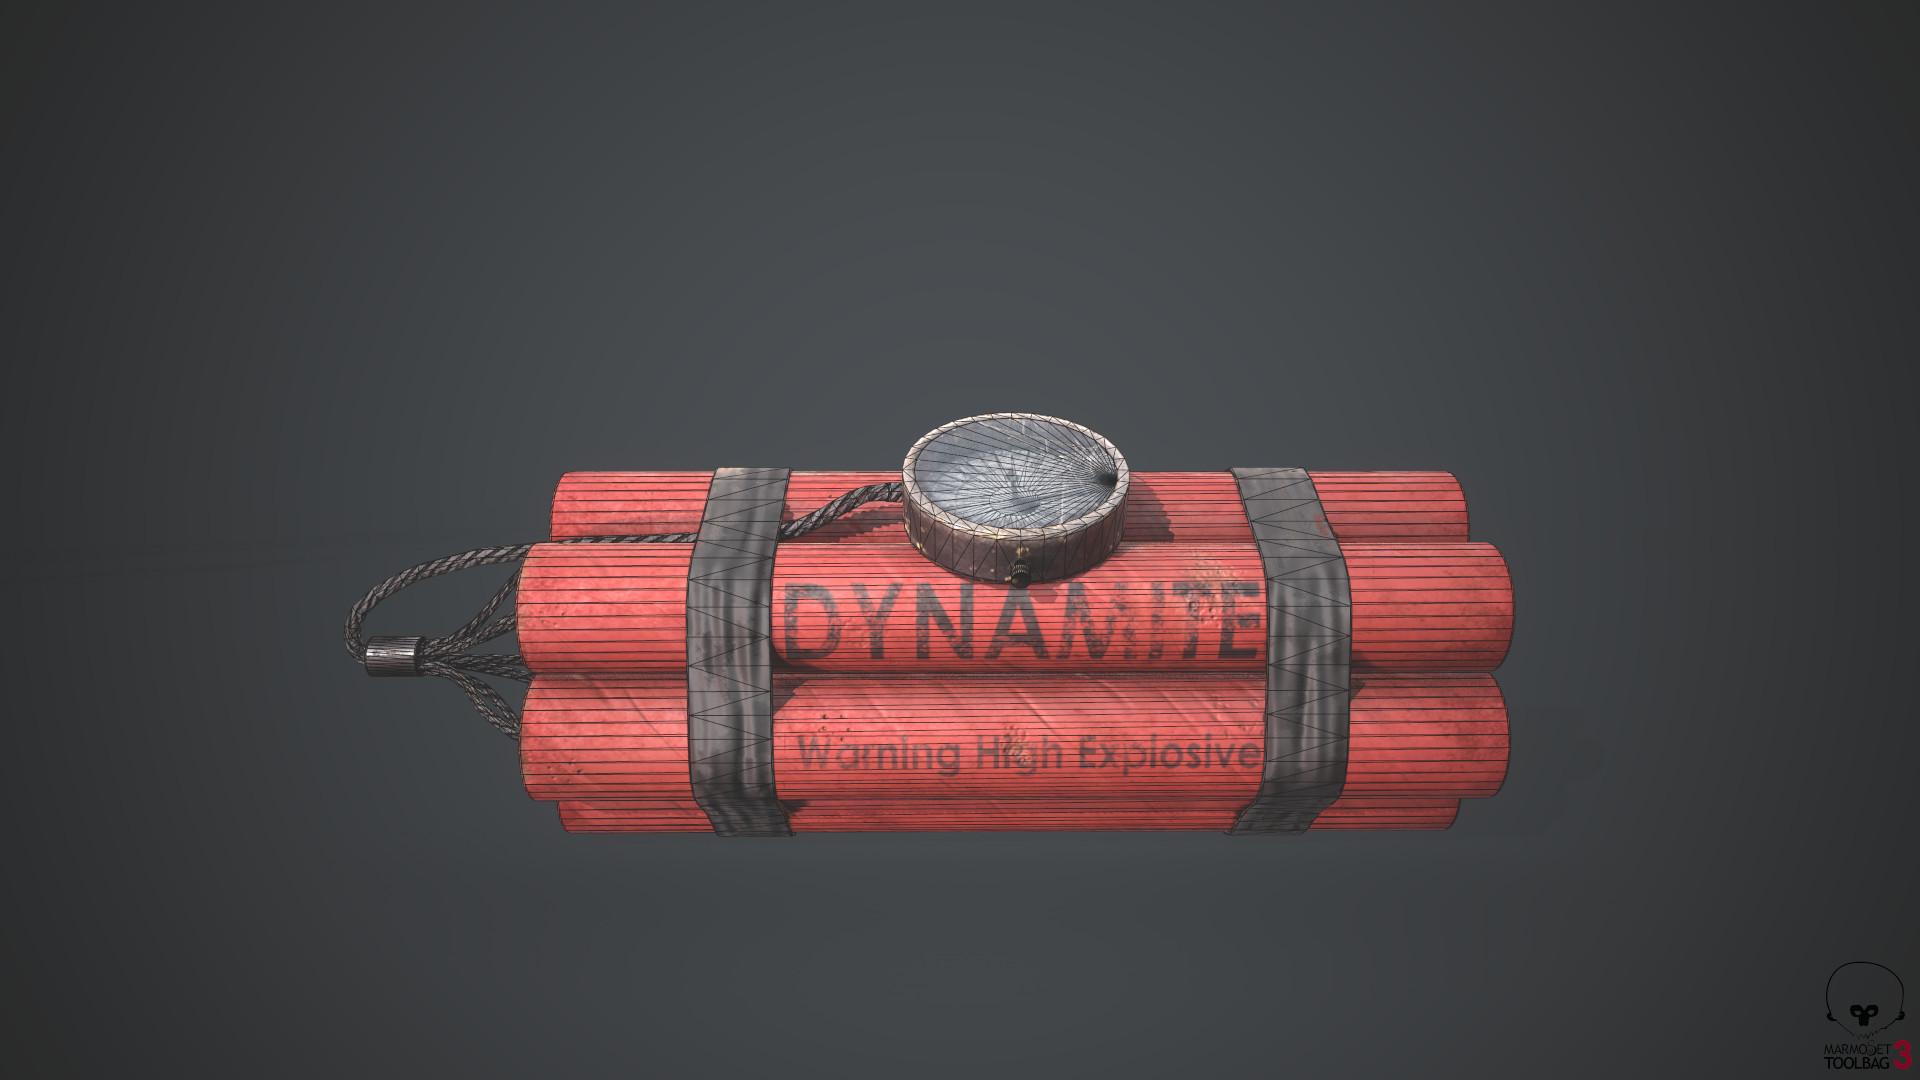 Serdar cendik dynamitewireframe